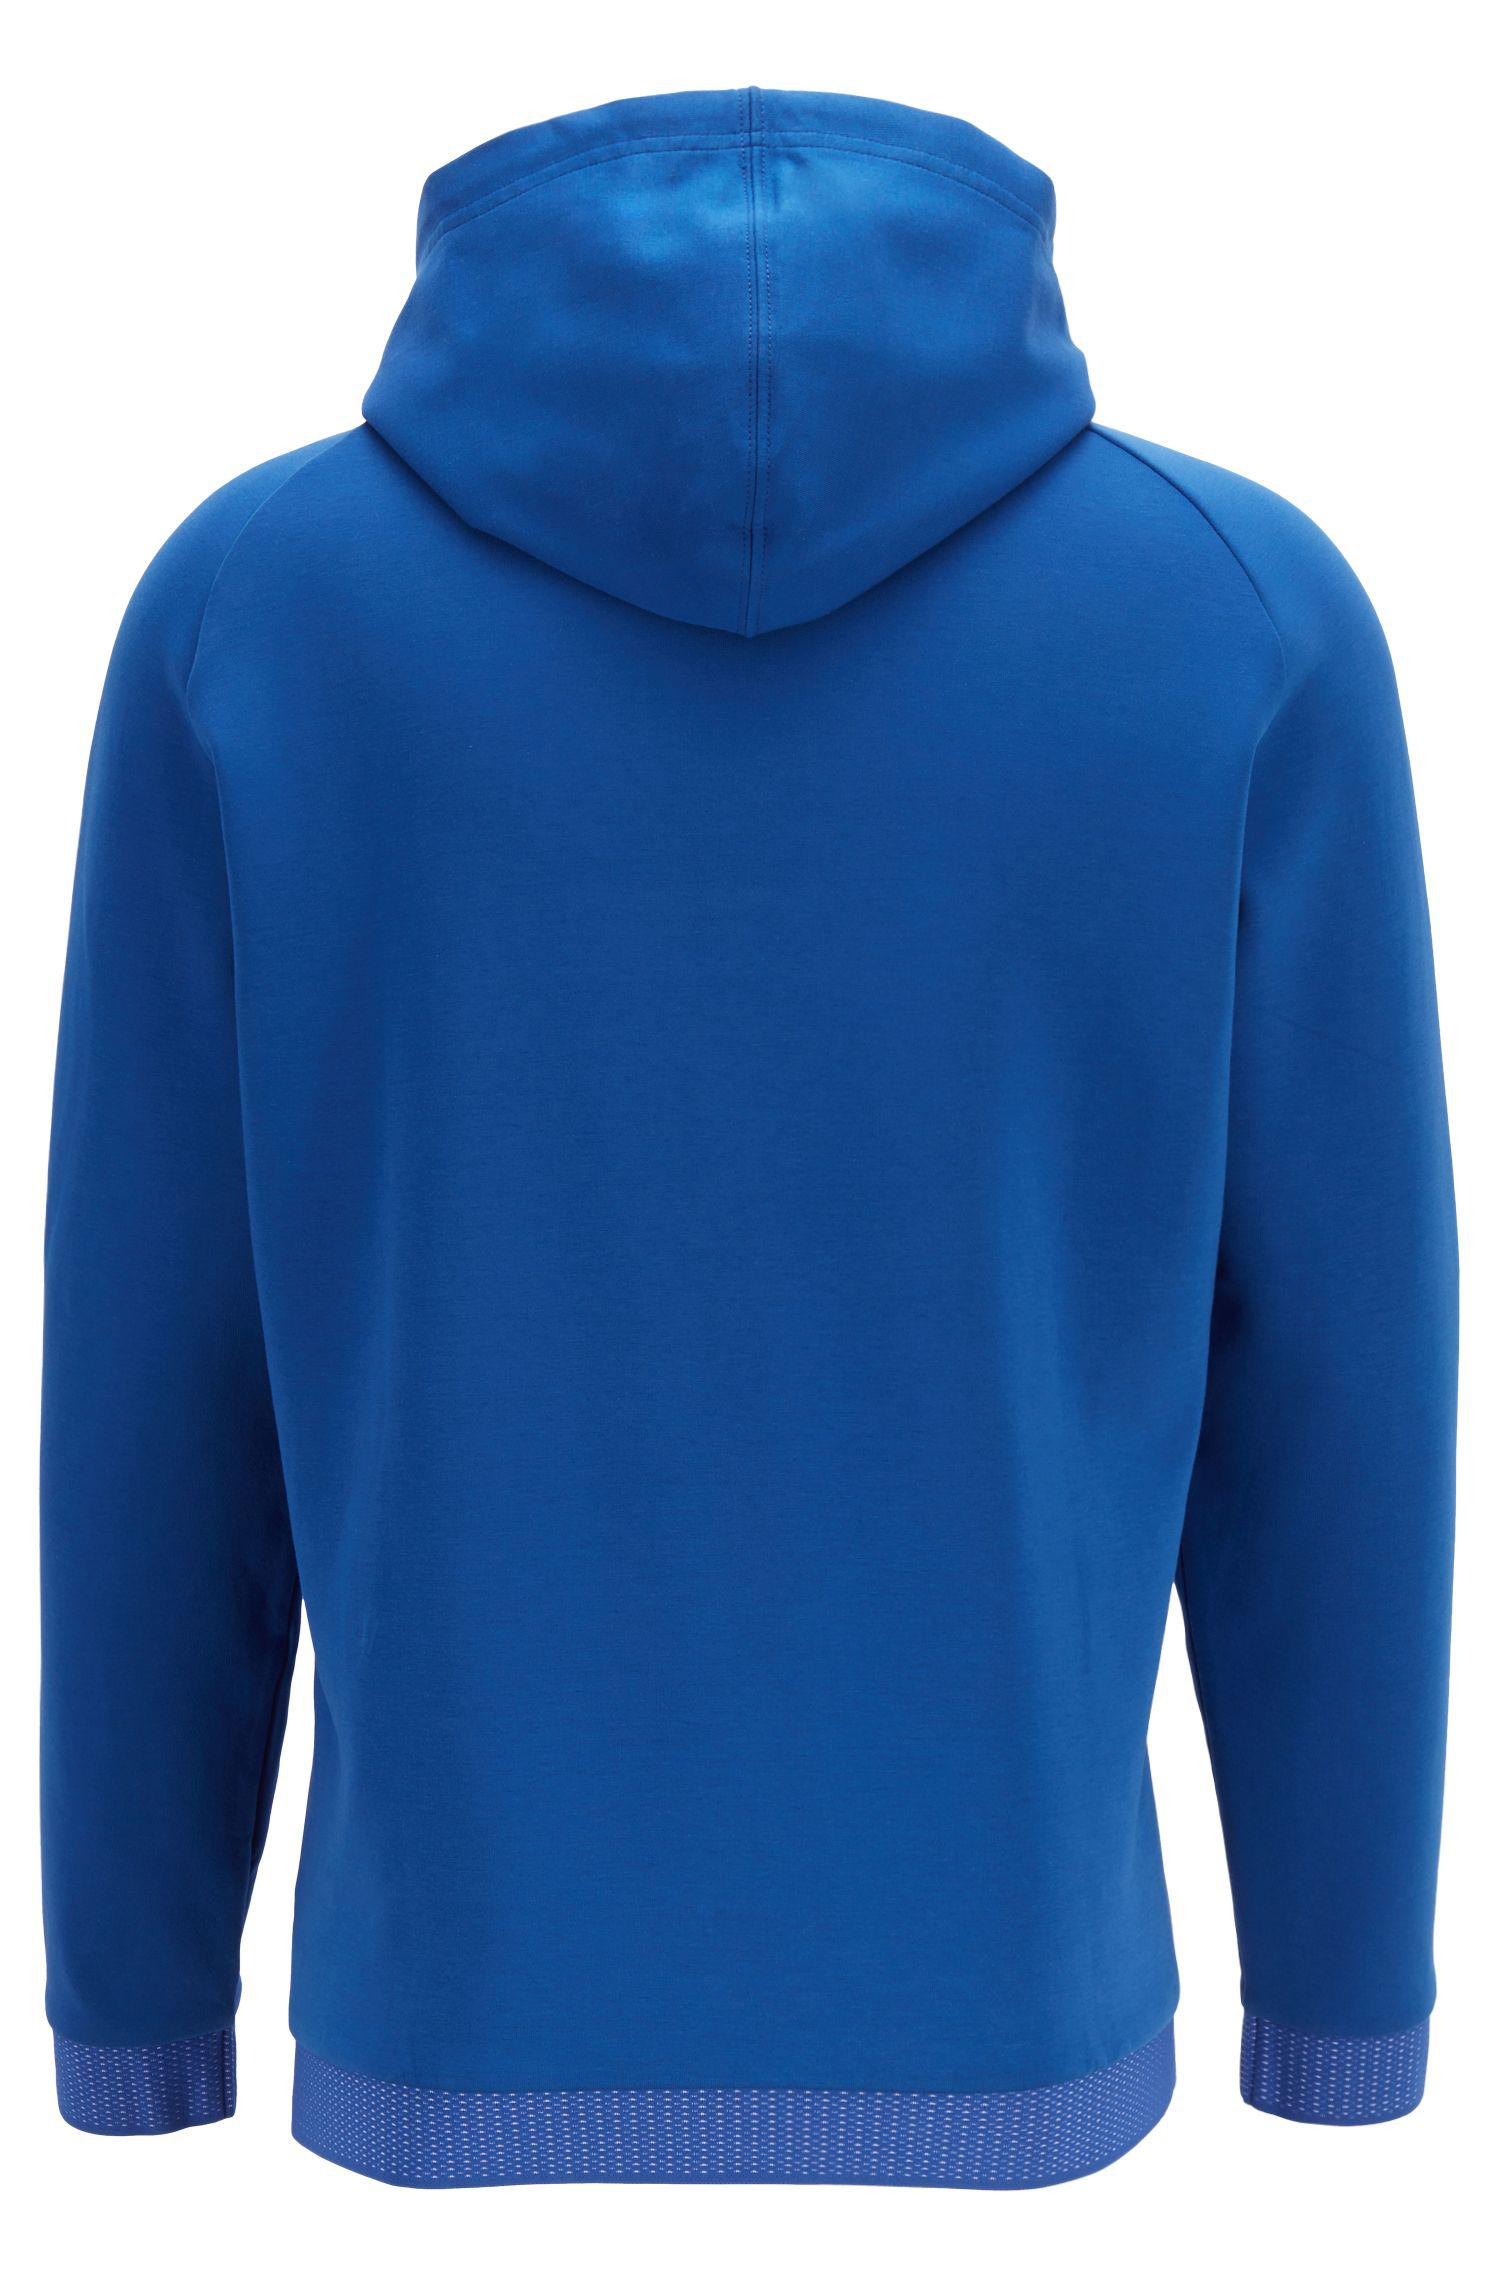 f45824f1 BOSS - Blue Relaxed-fit Hooded Sweatshirt With Zipper Detail for Men -  Lyst. View fullscreen